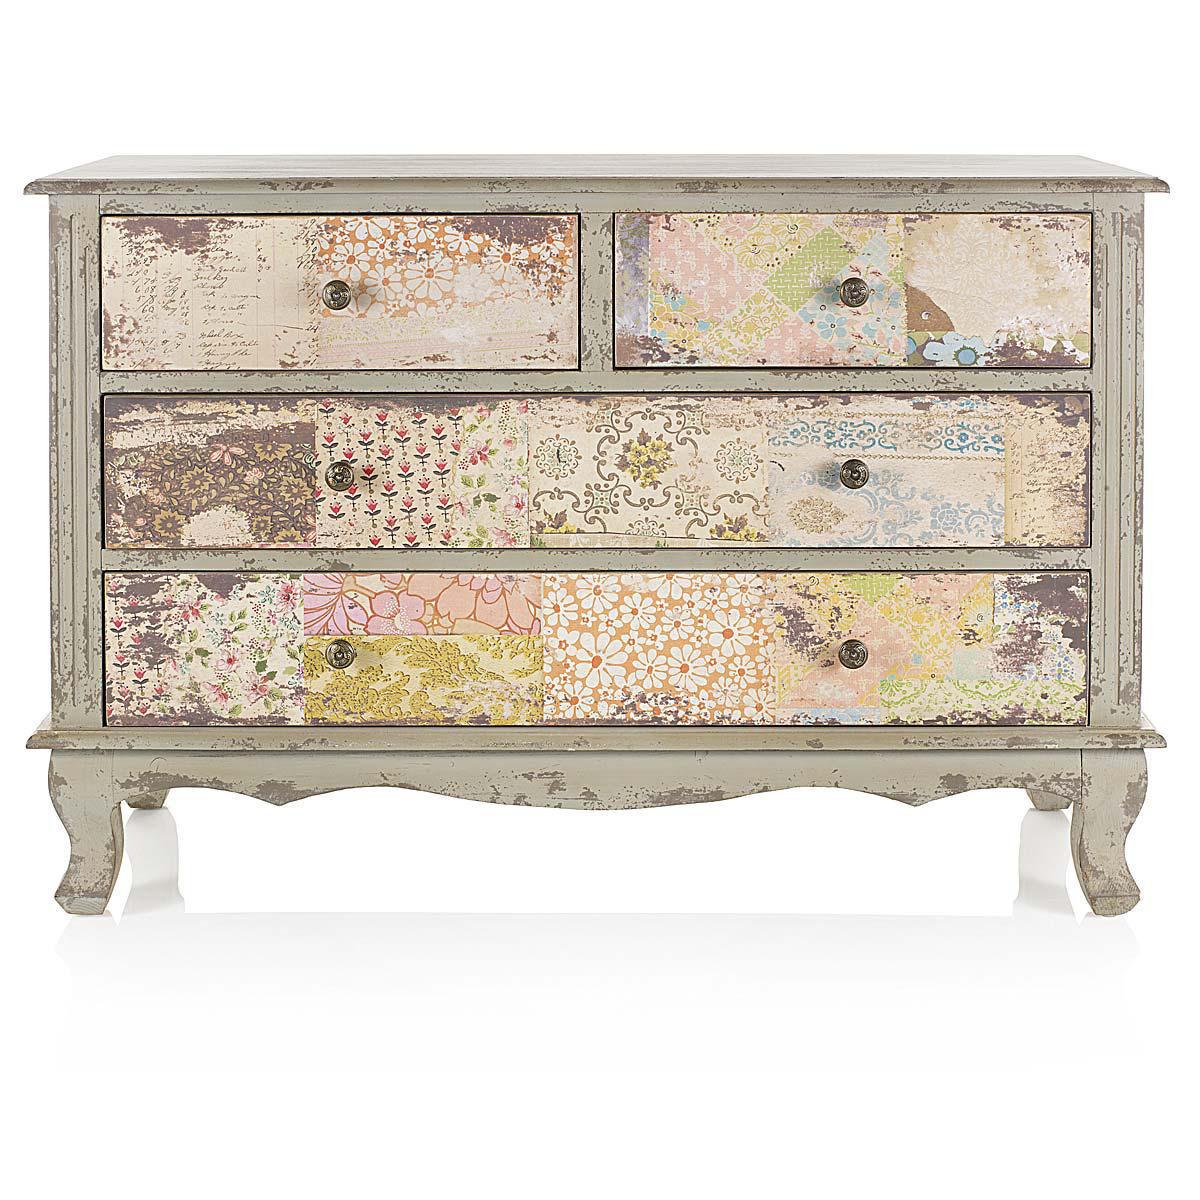 vintage kommode mit schubladen inspirierendes design f r wohnm bel. Black Bedroom Furniture Sets. Home Design Ideas